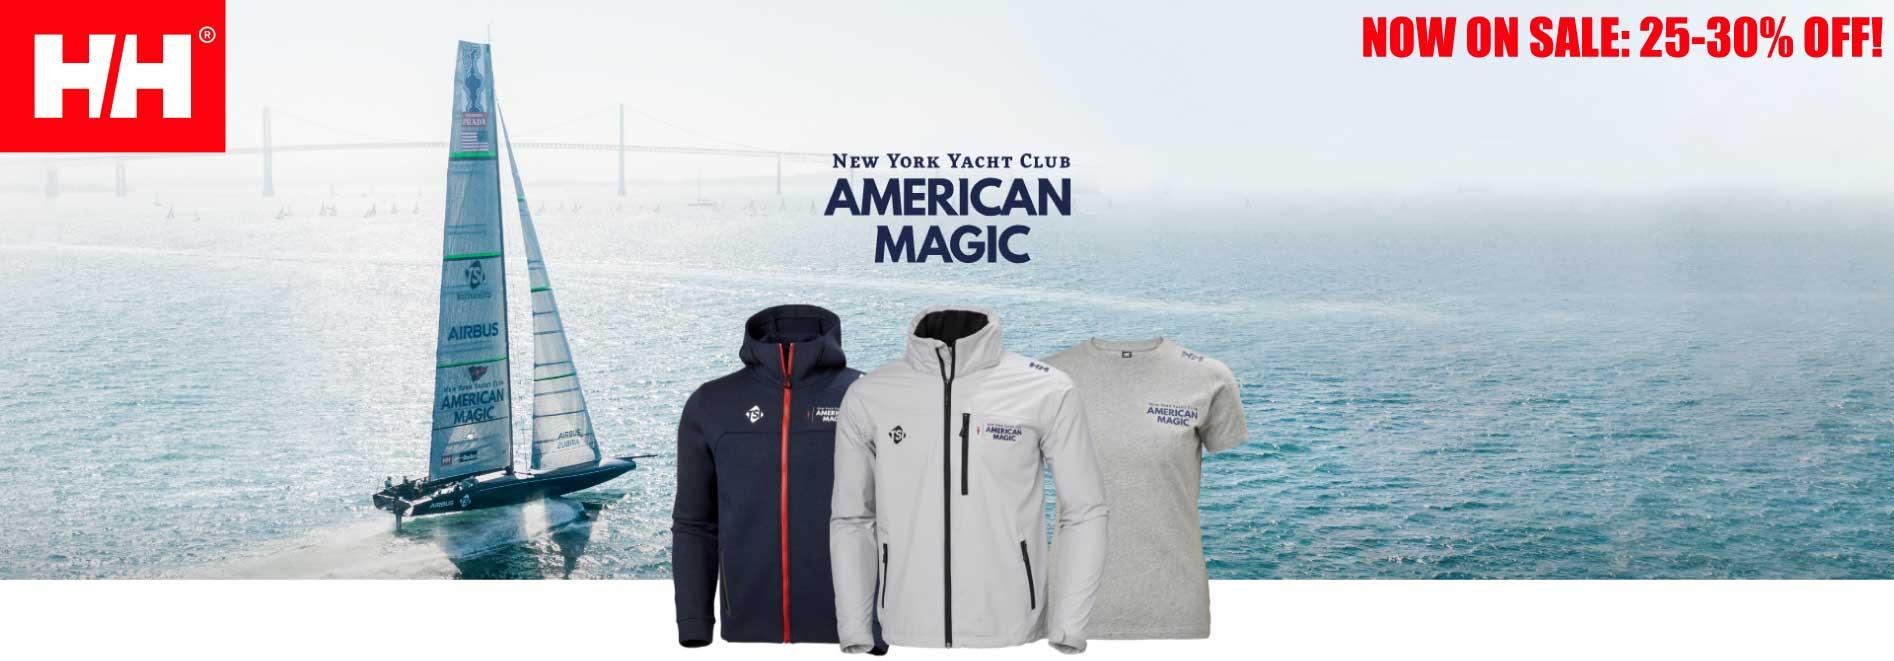 helly-hansen-american-magic-banner-a-sale.jpg